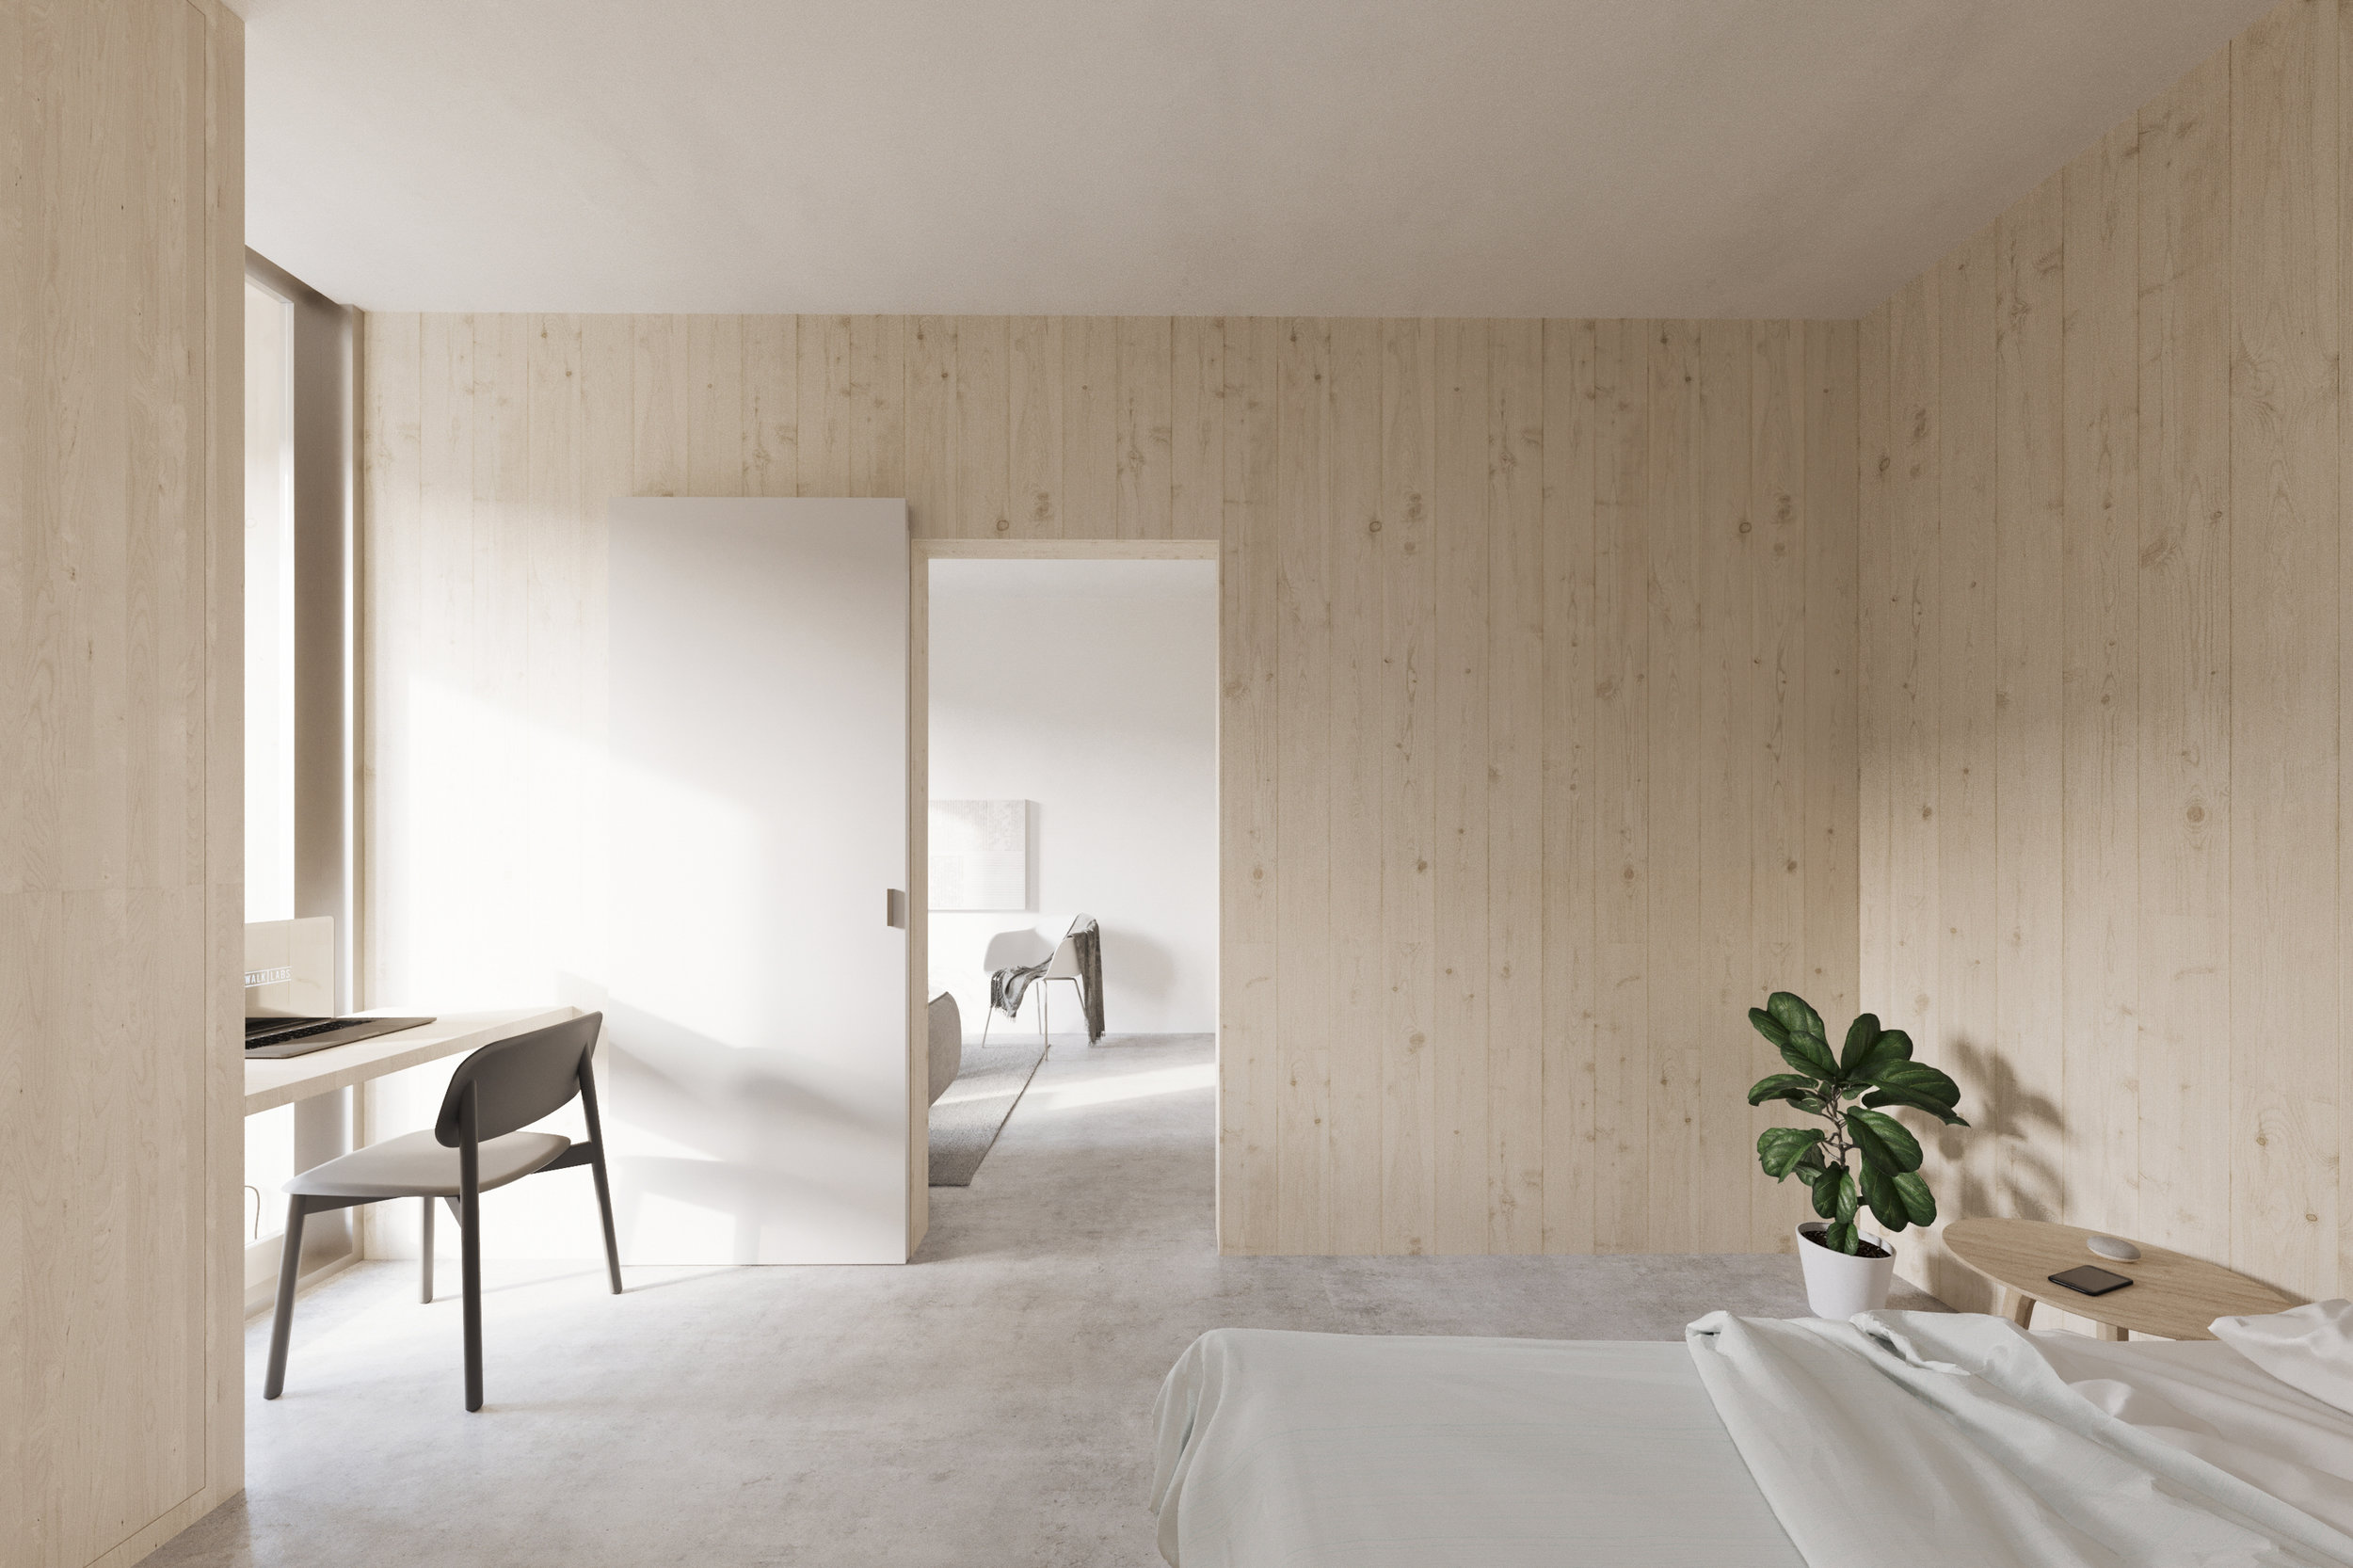 gh3 - SWL - Units - 1BR - Bedroom